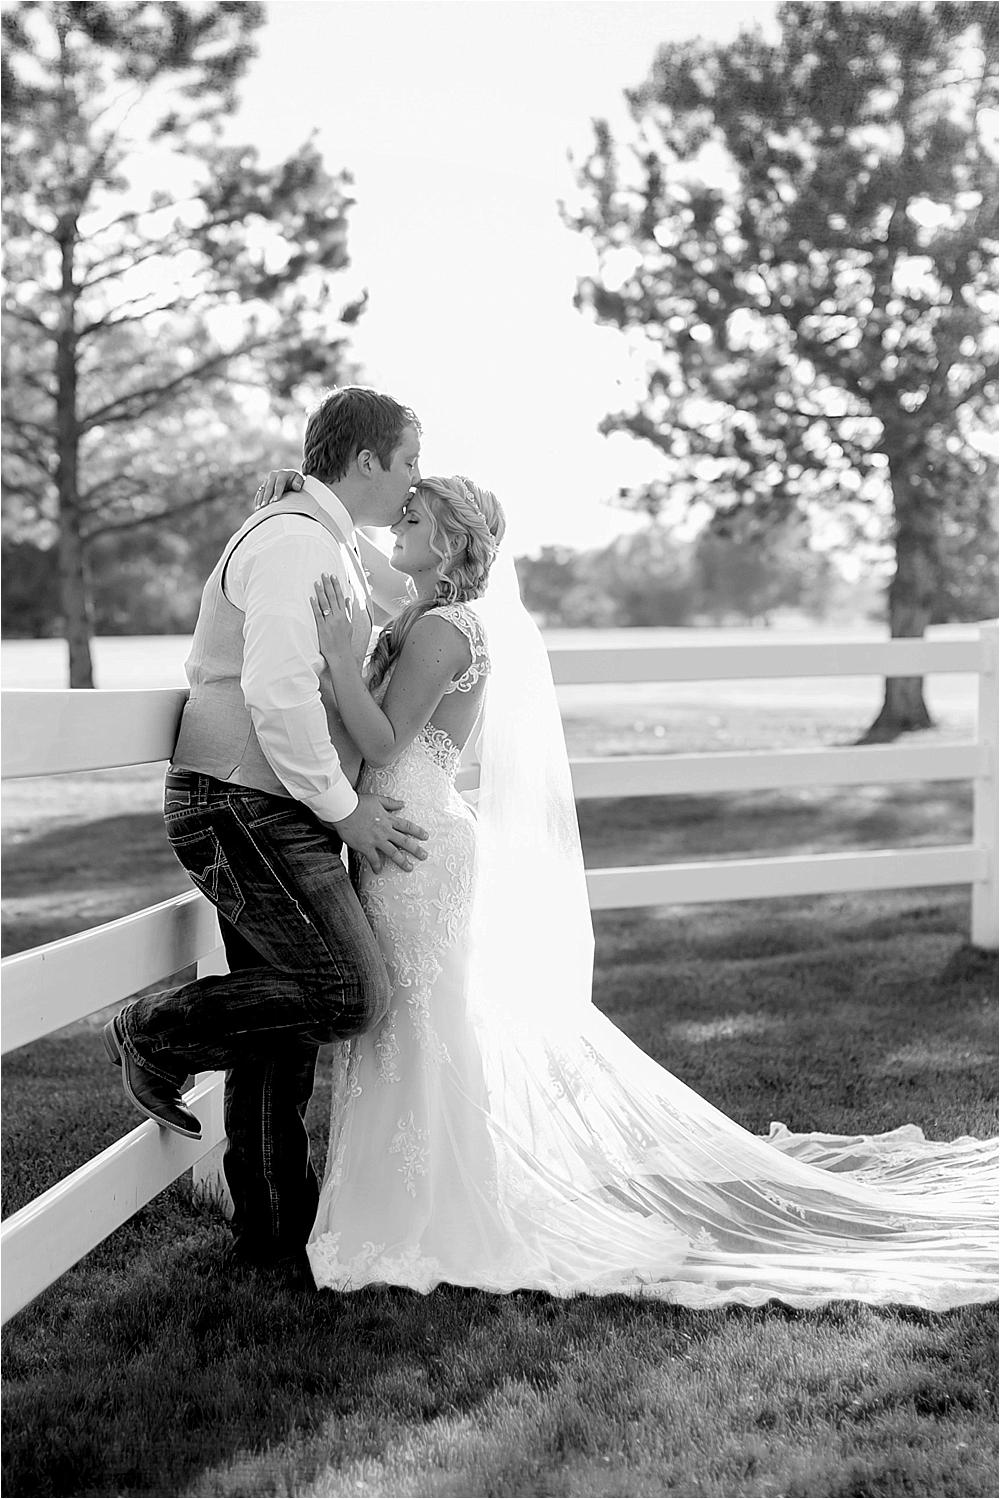 Tessi + Bryce's Raccoon Creek Wedding_0047.jpg